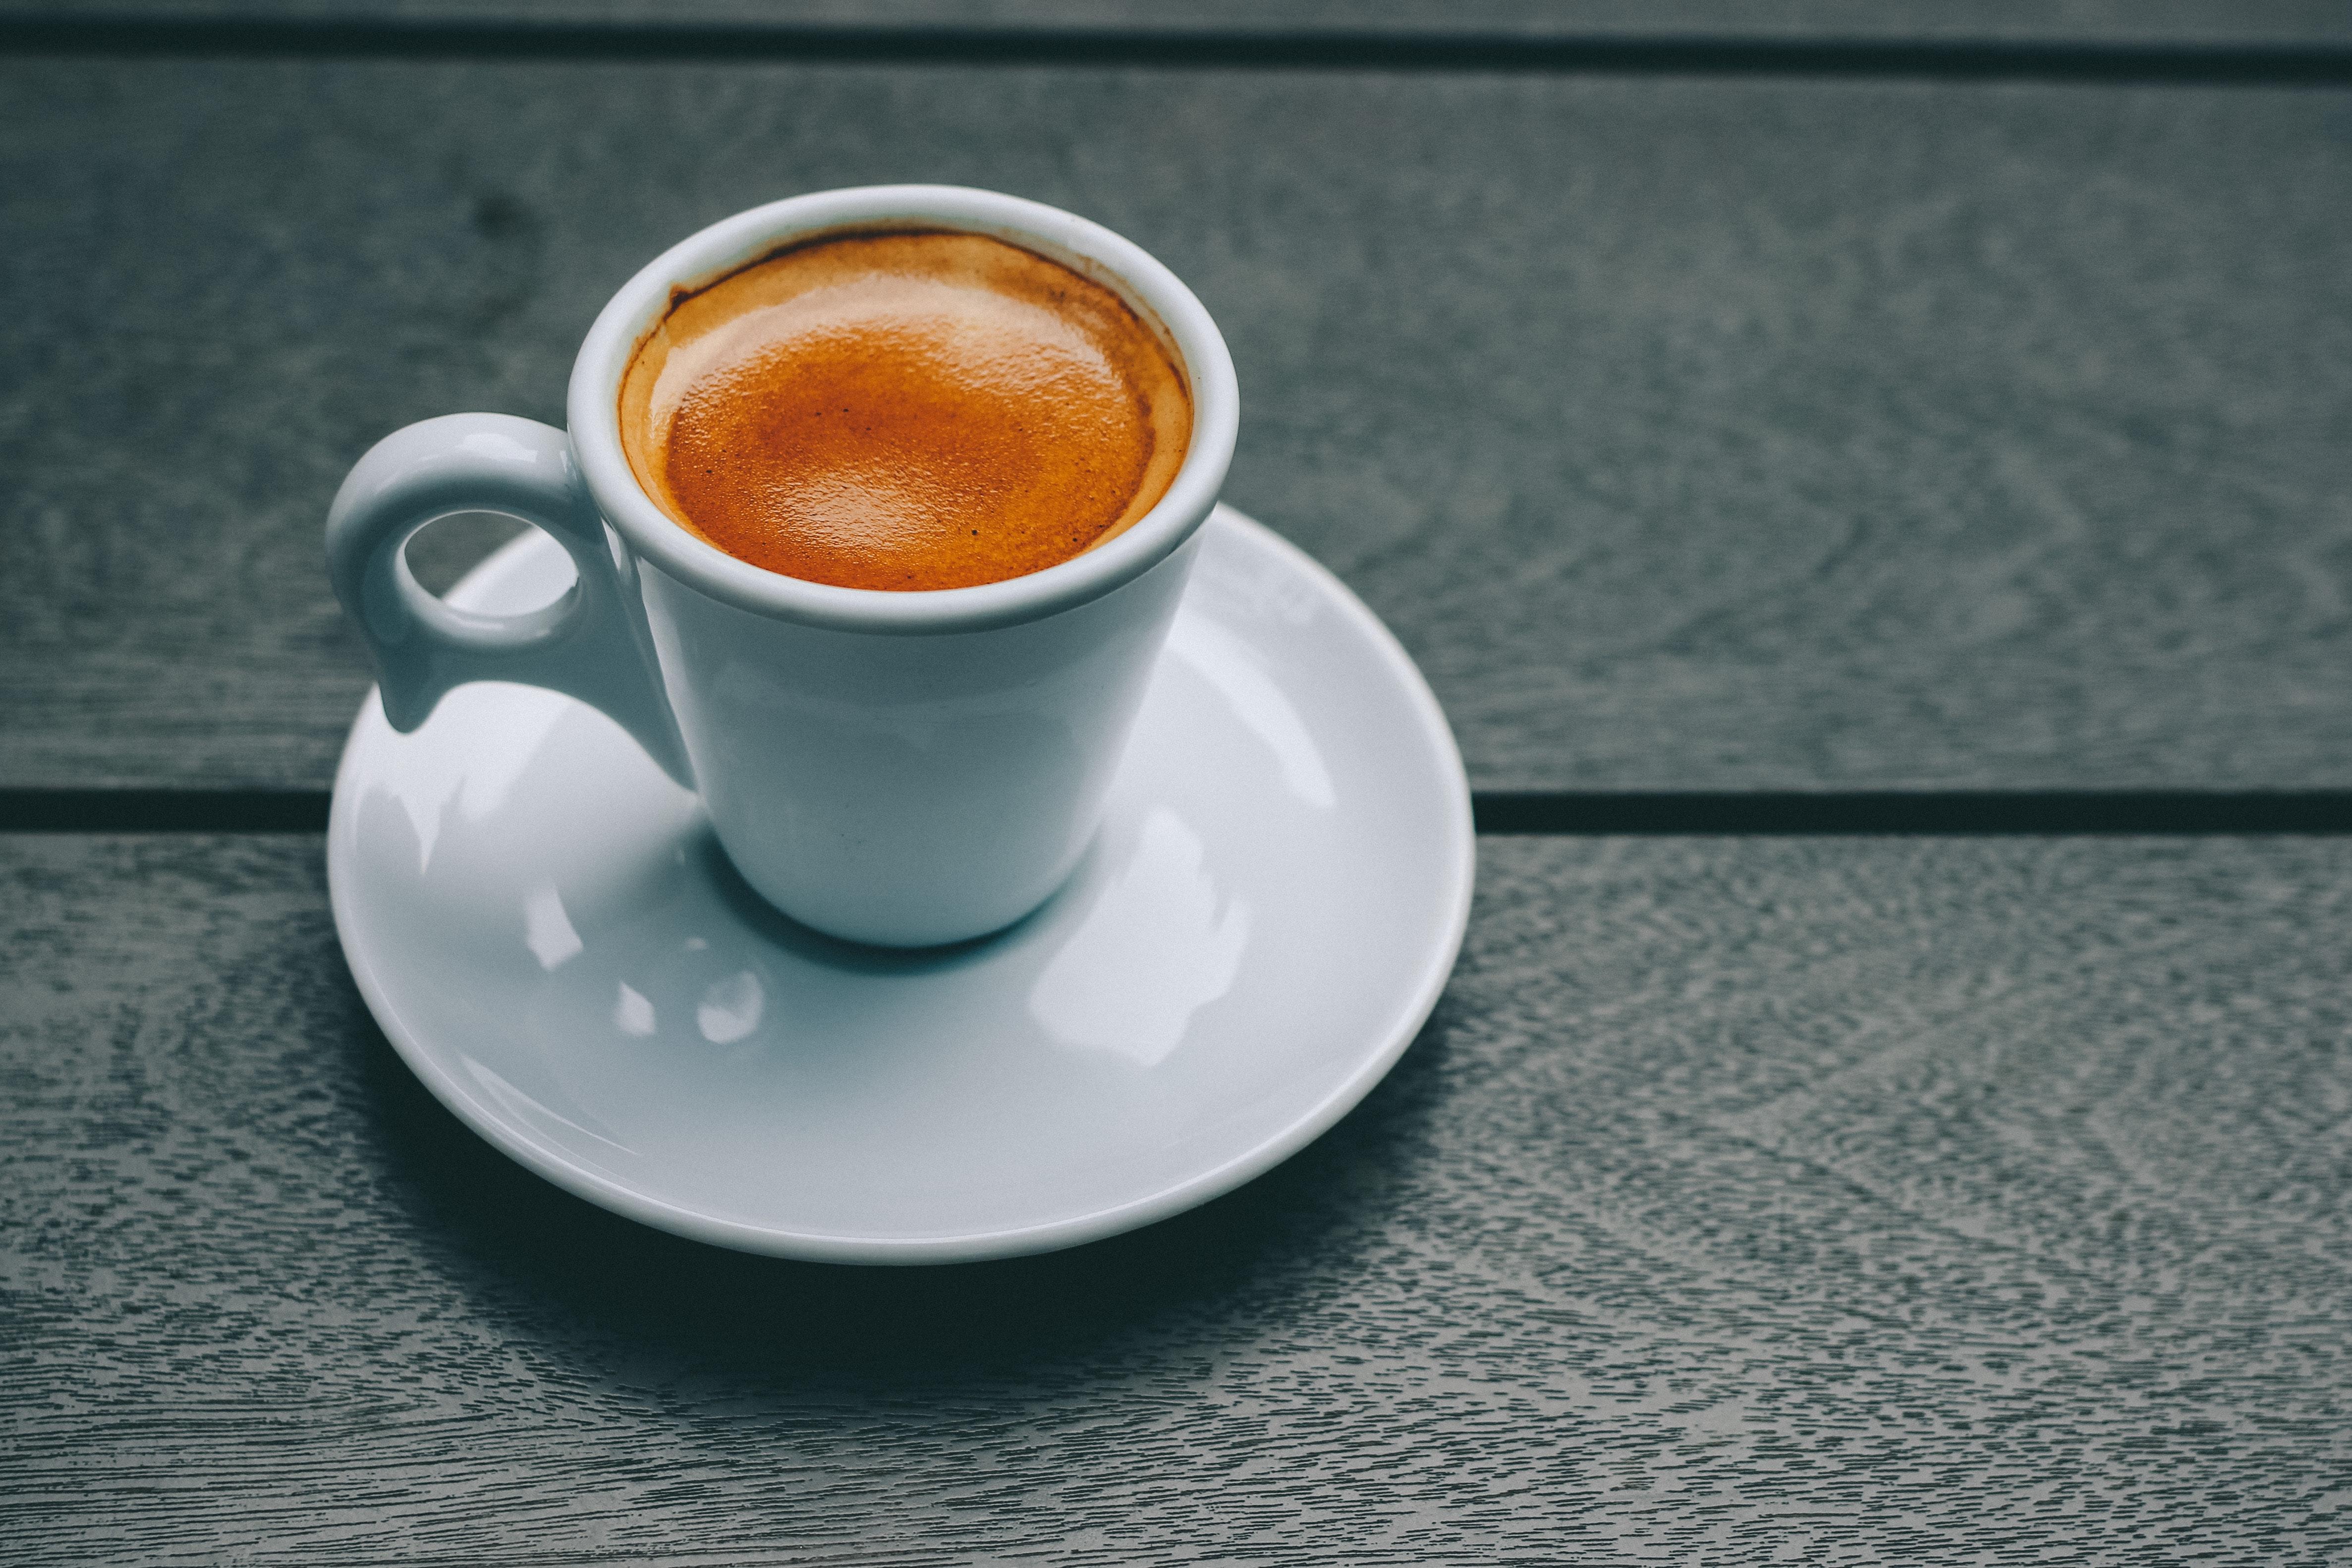 White ceramic mug and saucer photo